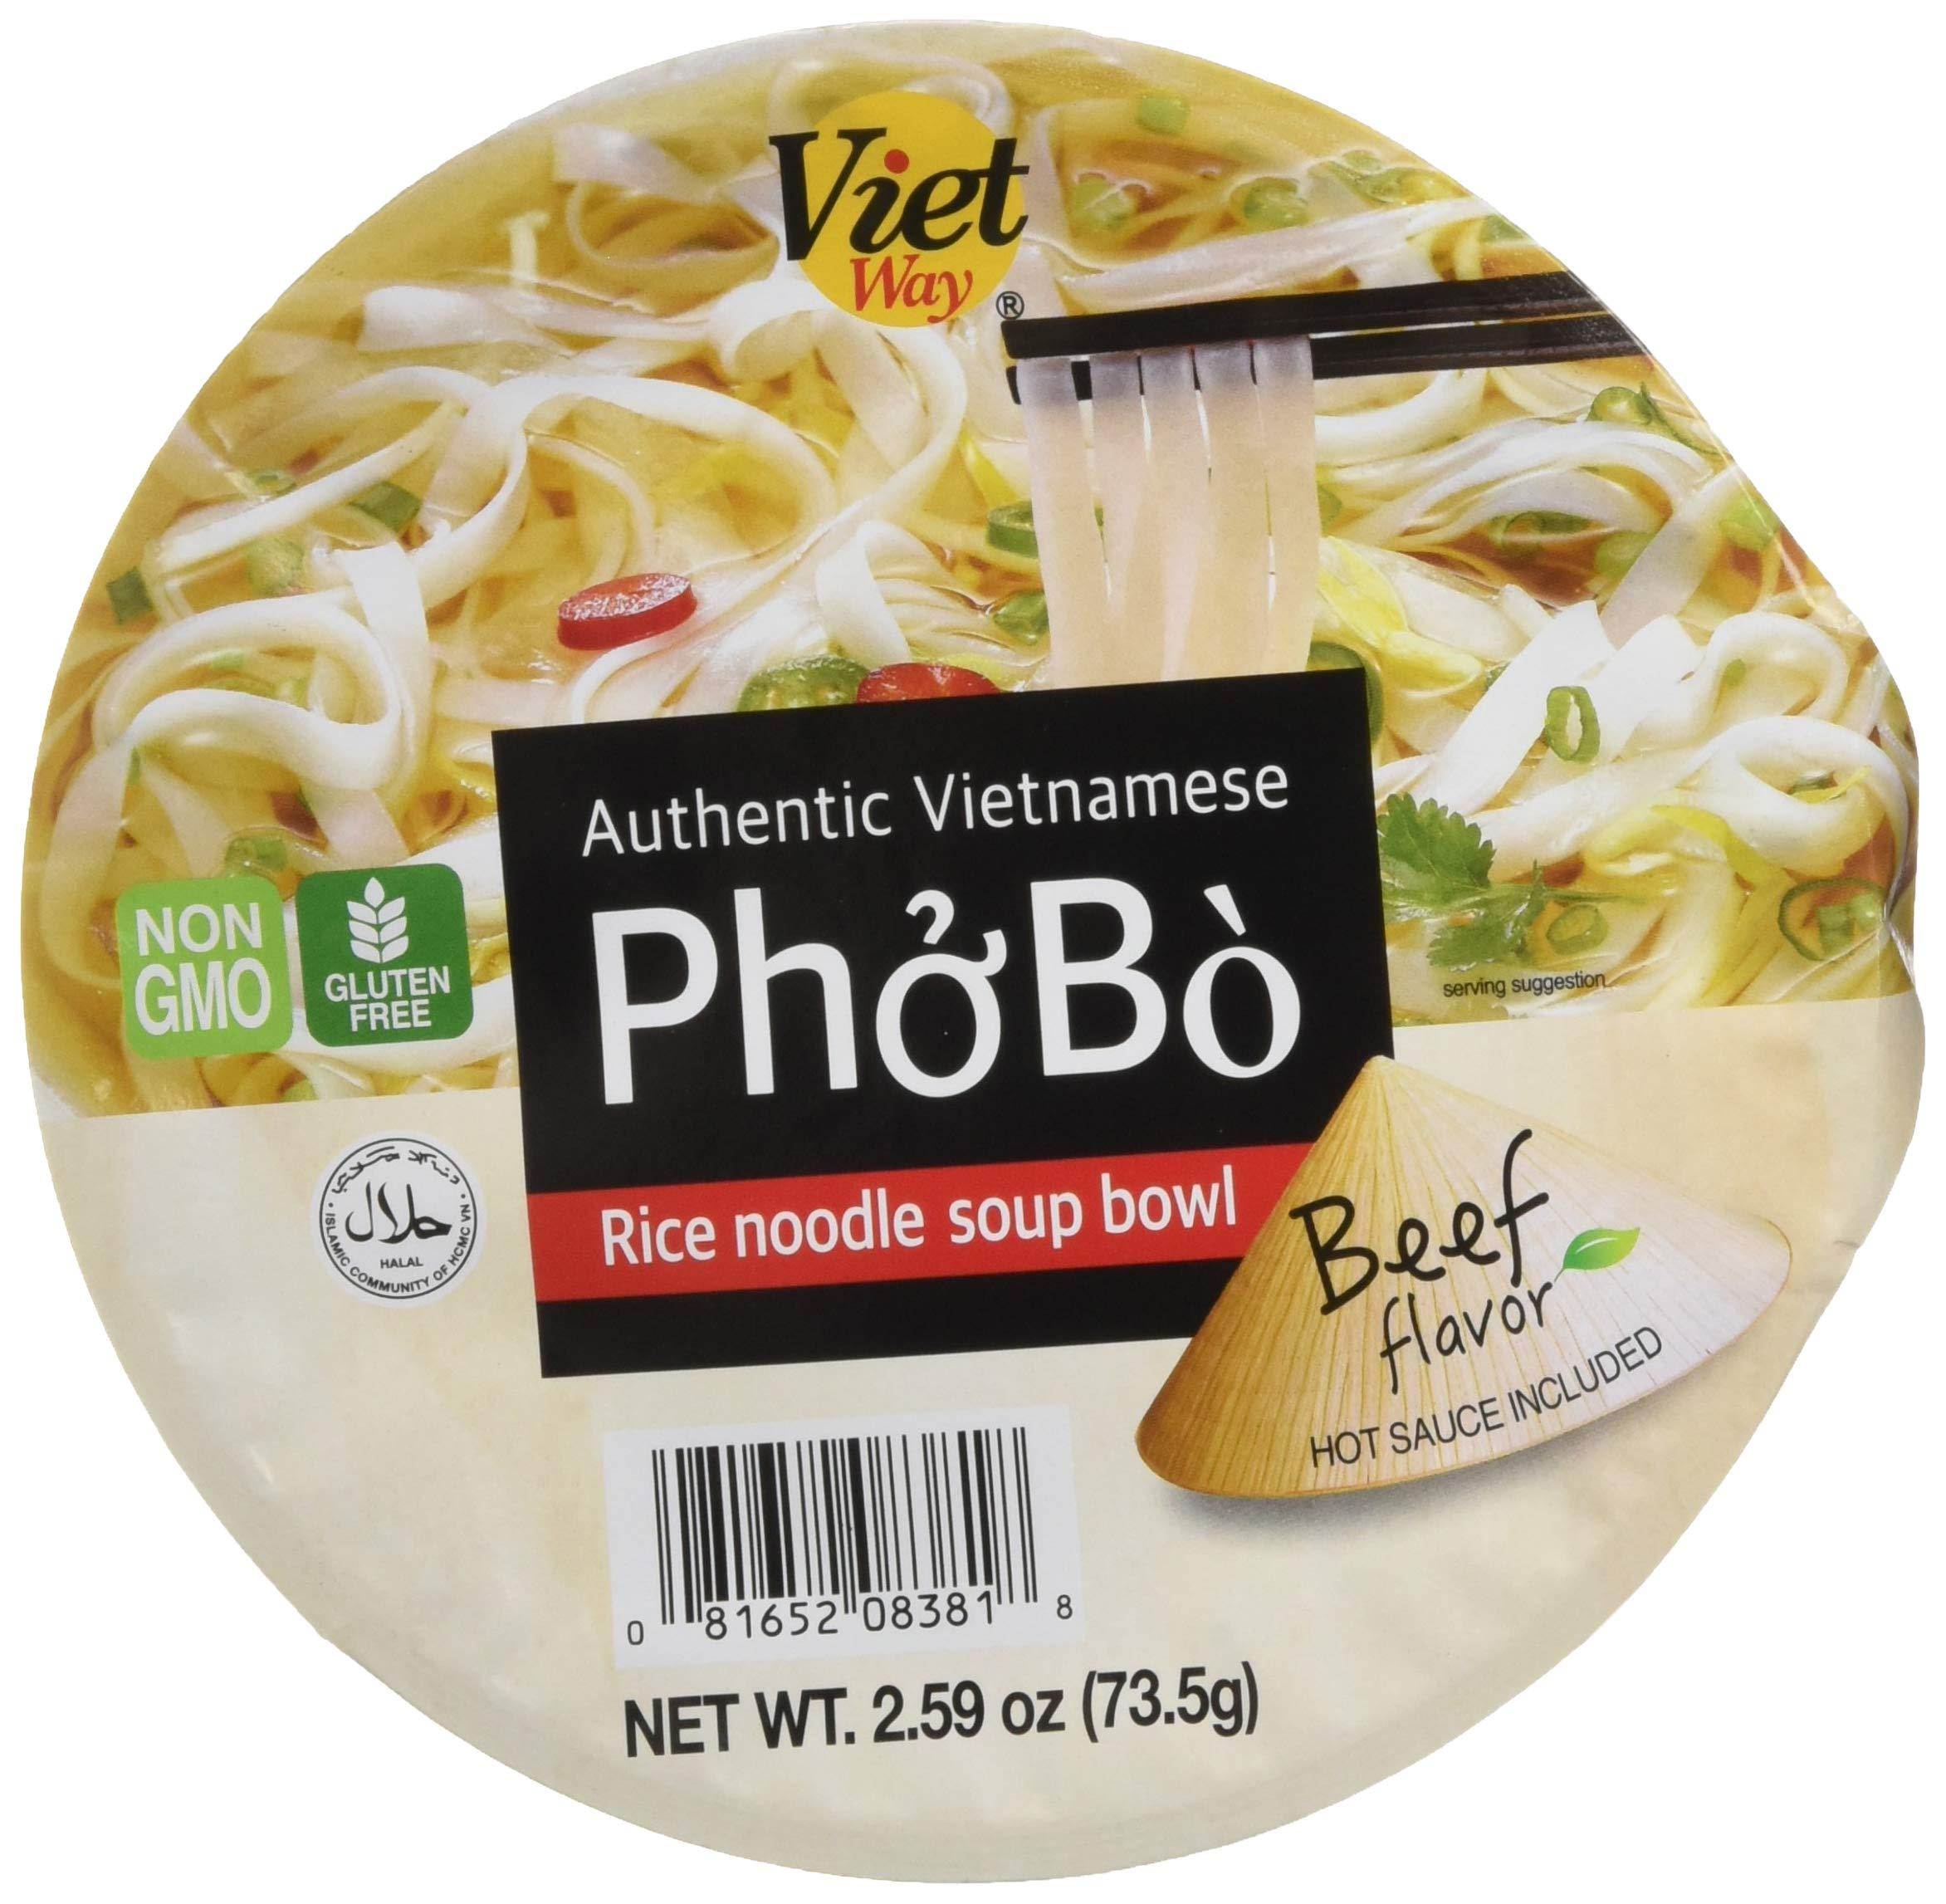 Authentic Vietnamese Pho Bo Rice Noodle Soup Bowl (8) by Viet Way